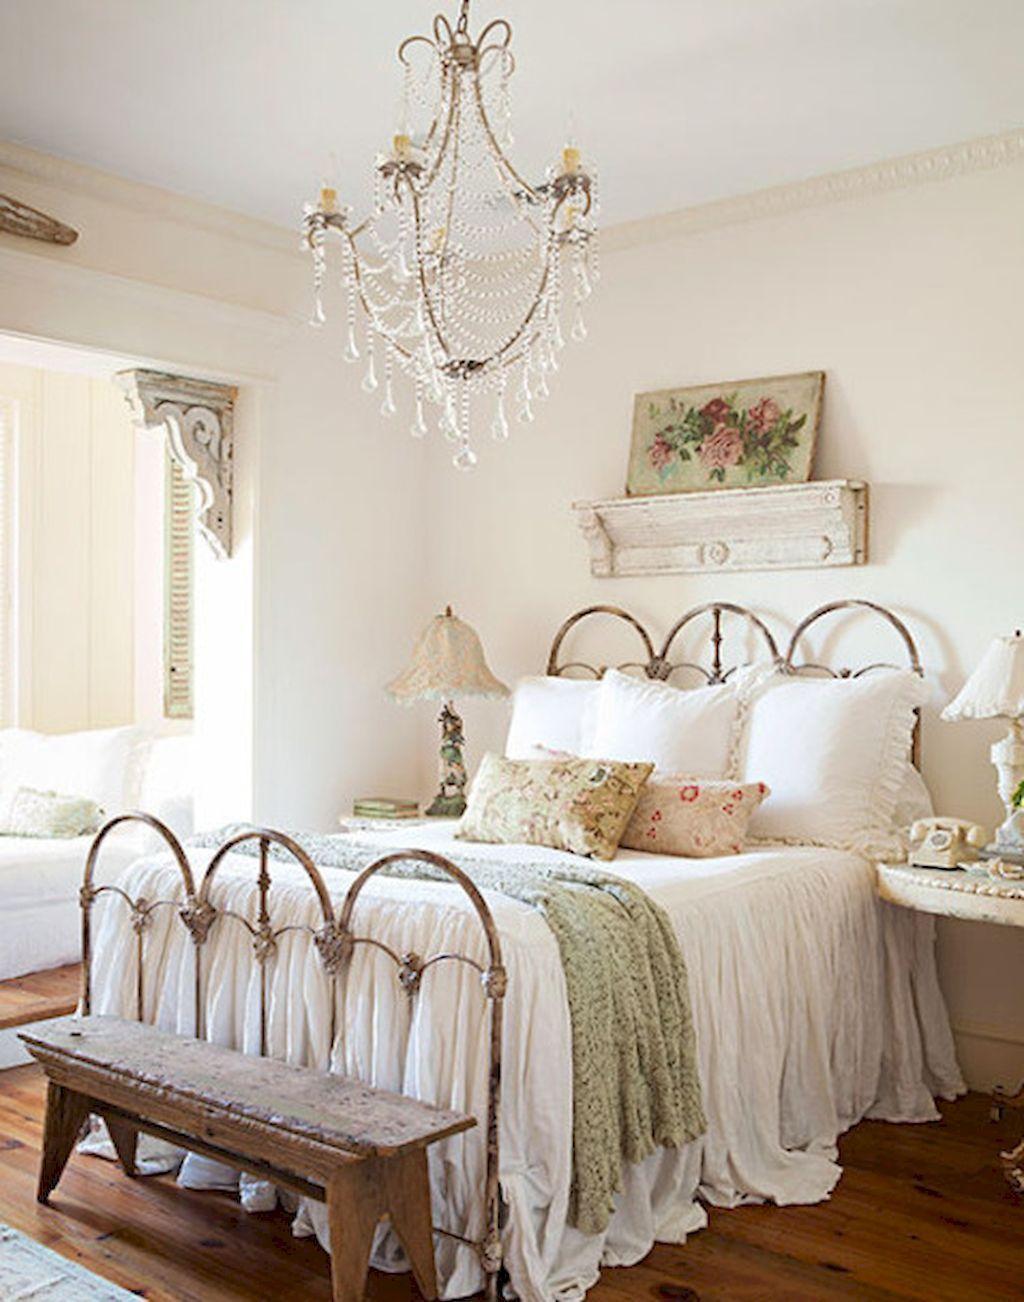 Romantic Shabby Chic Bedroom Decorating Ideas (41) #RomanticBedrooms